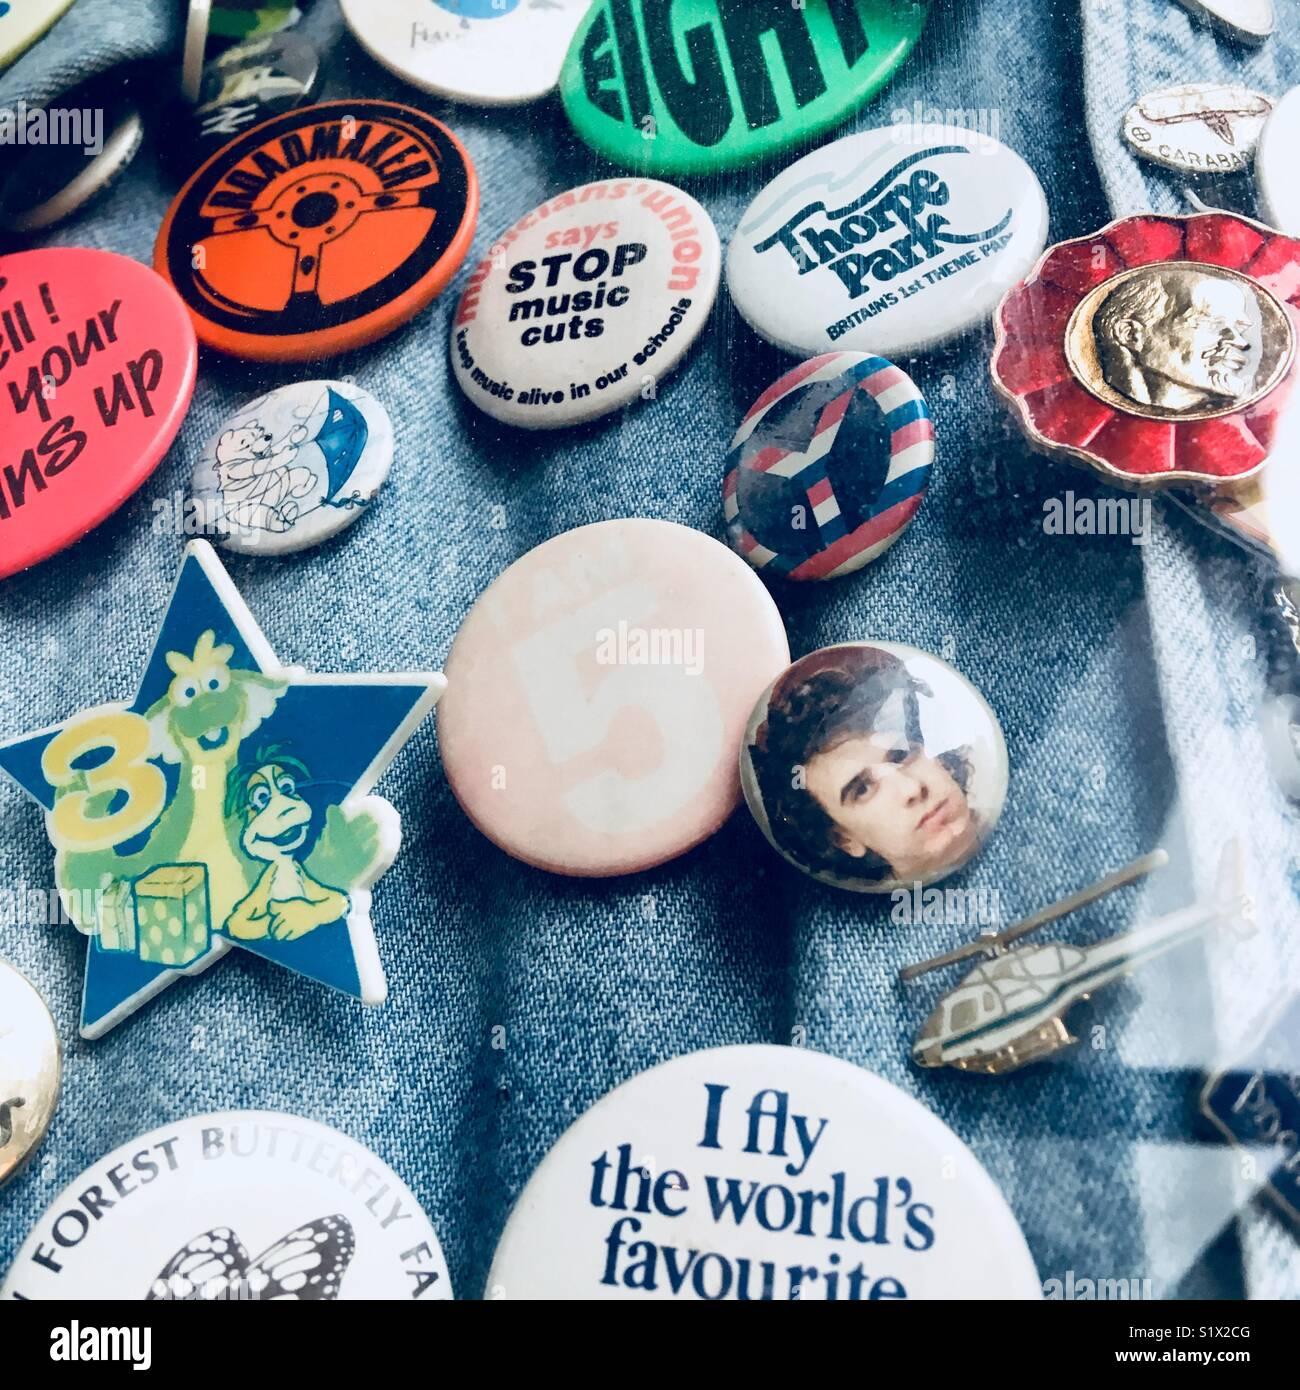 Eightie badge è imperniata ad una camicia di denim. Immagini Stock